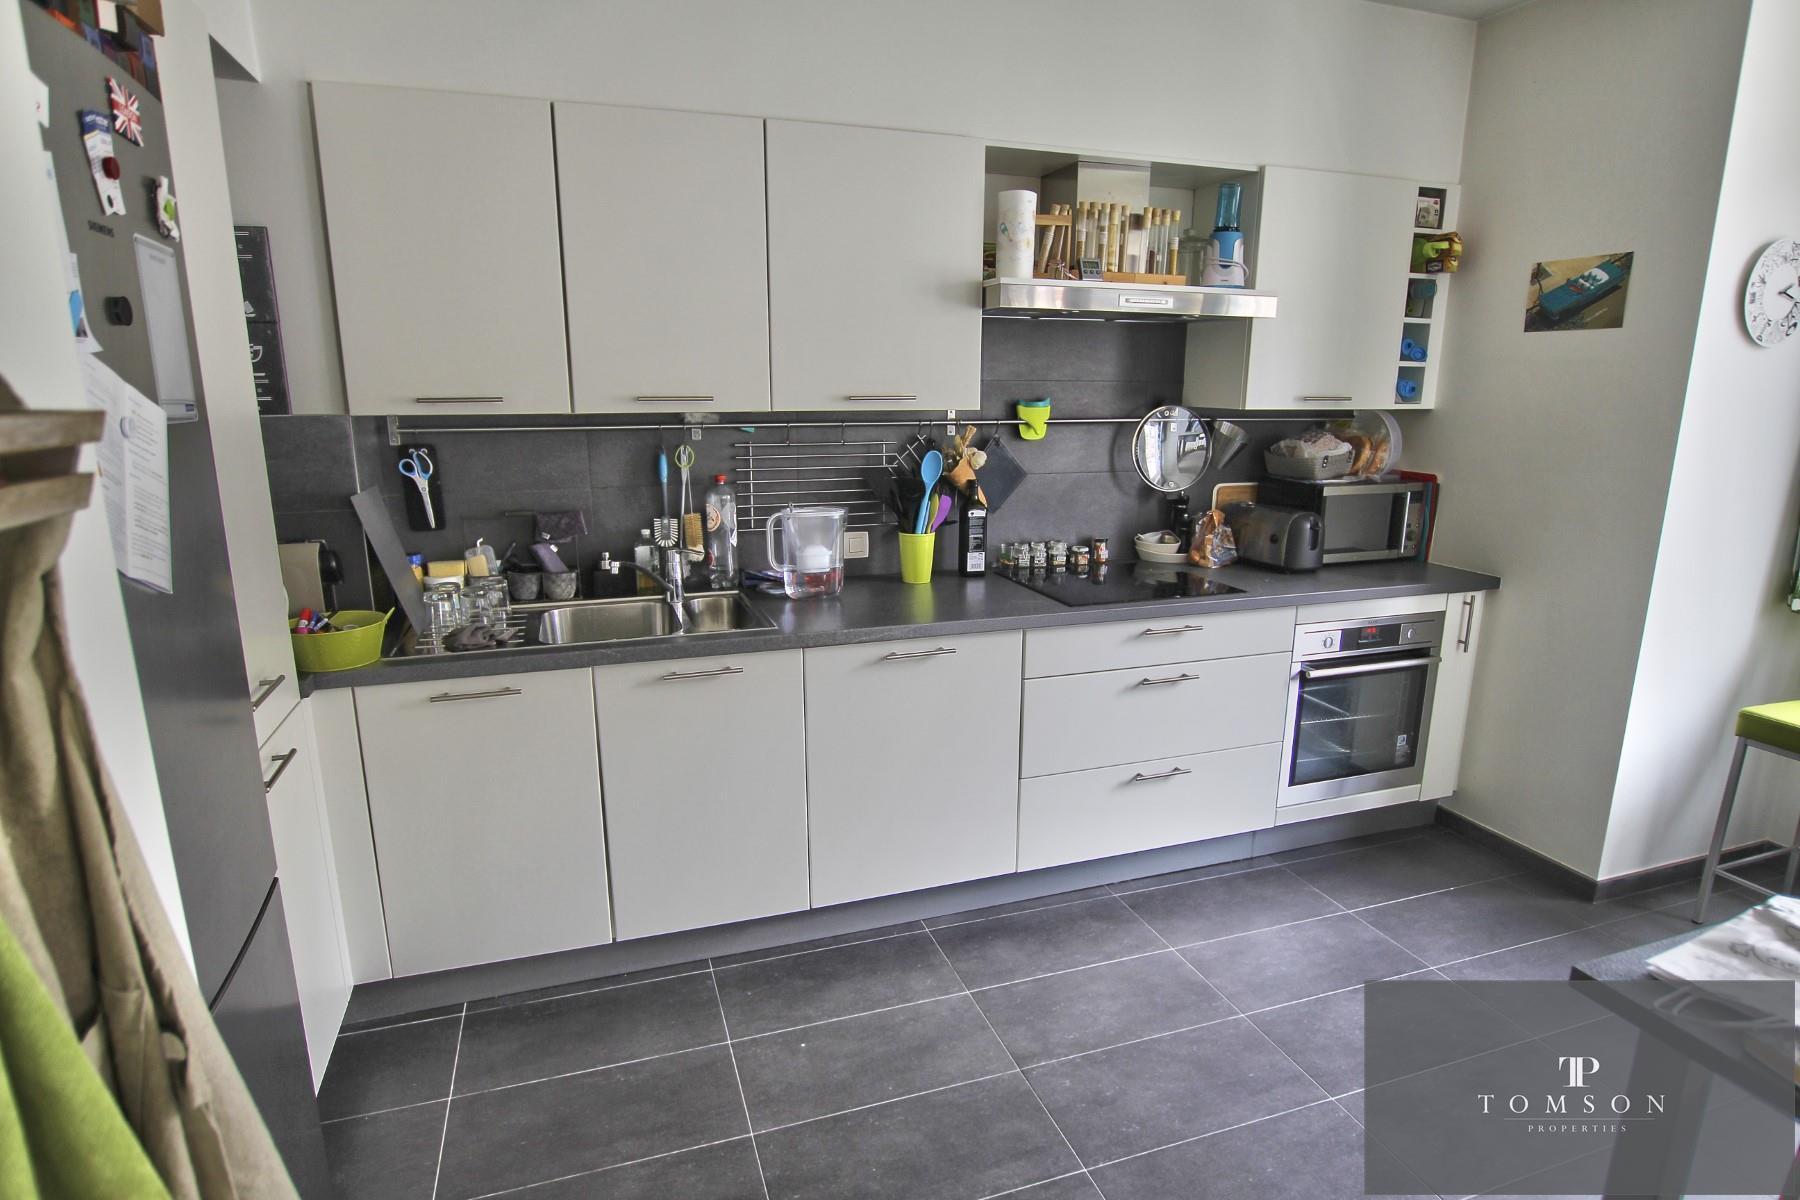 Appartement exceptionnel - Woluwe-Saint-Pierre - #4324789-4